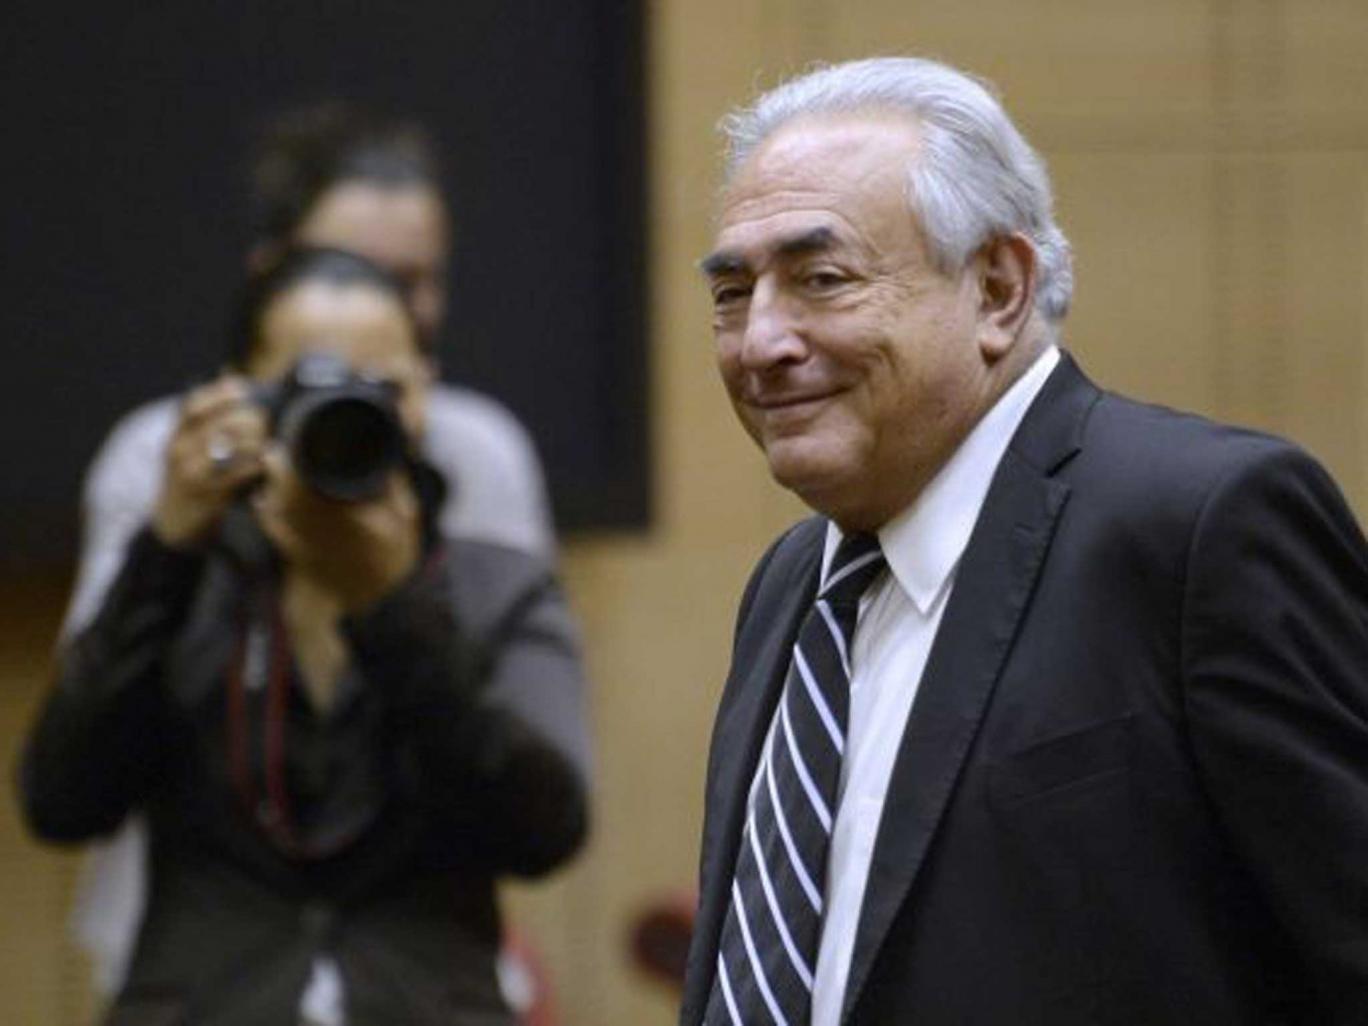 Dominique Strauss-Kahn: 'simple libertine activity'